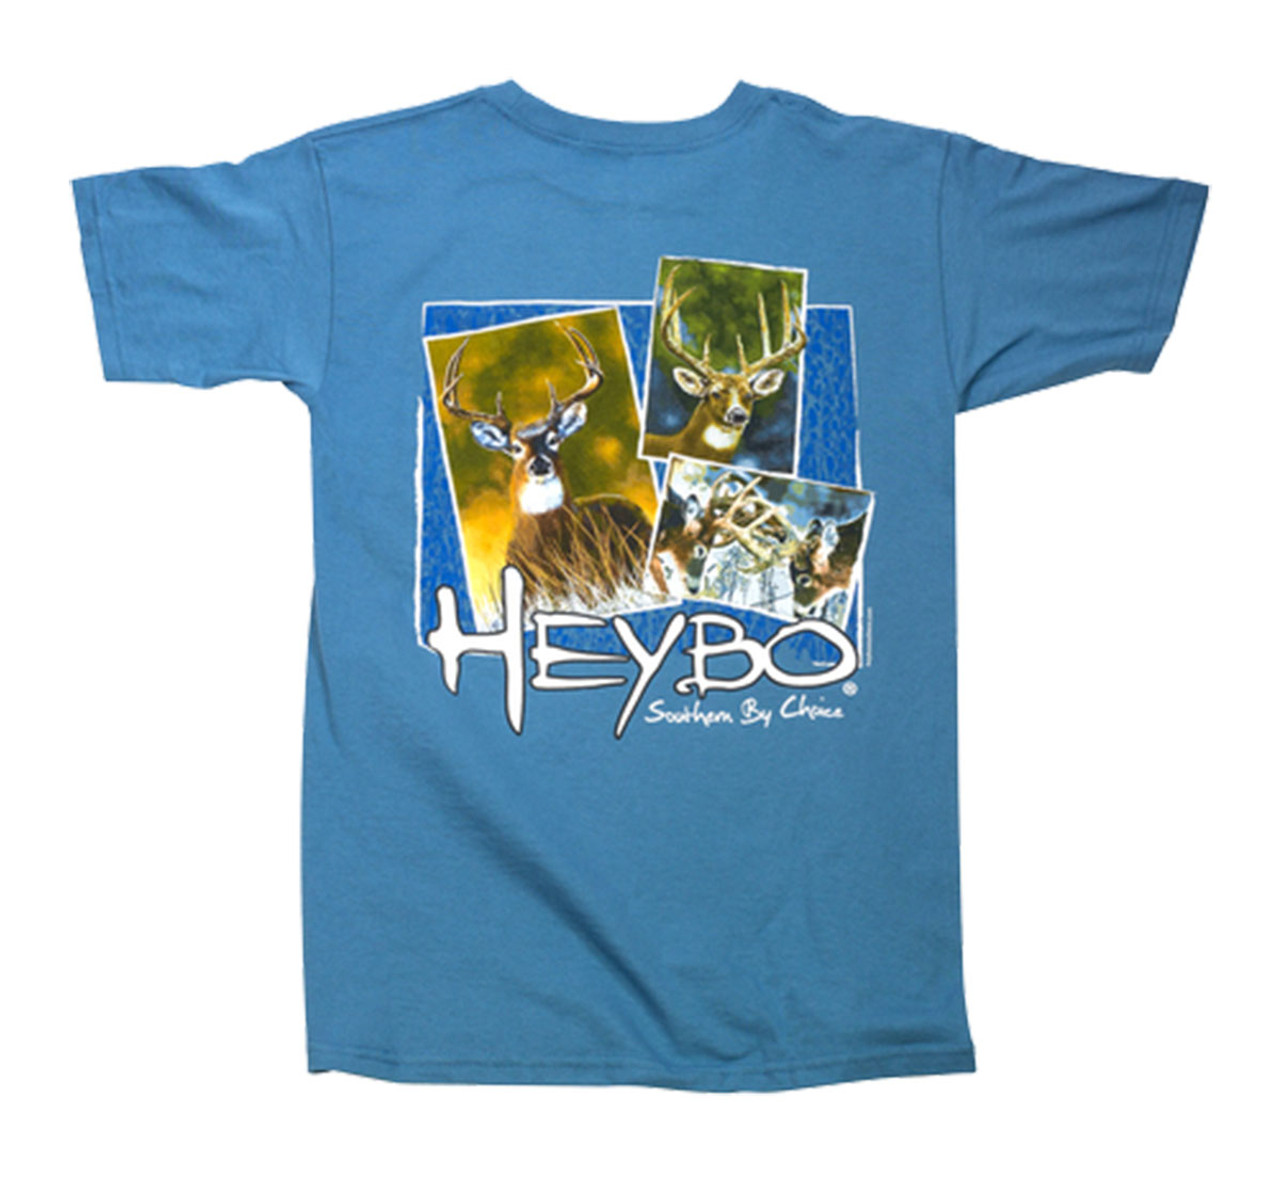 69ffca56 Heybo Men's Deer Collage Short Sleeve T-shirt - Trenz Shirt Company